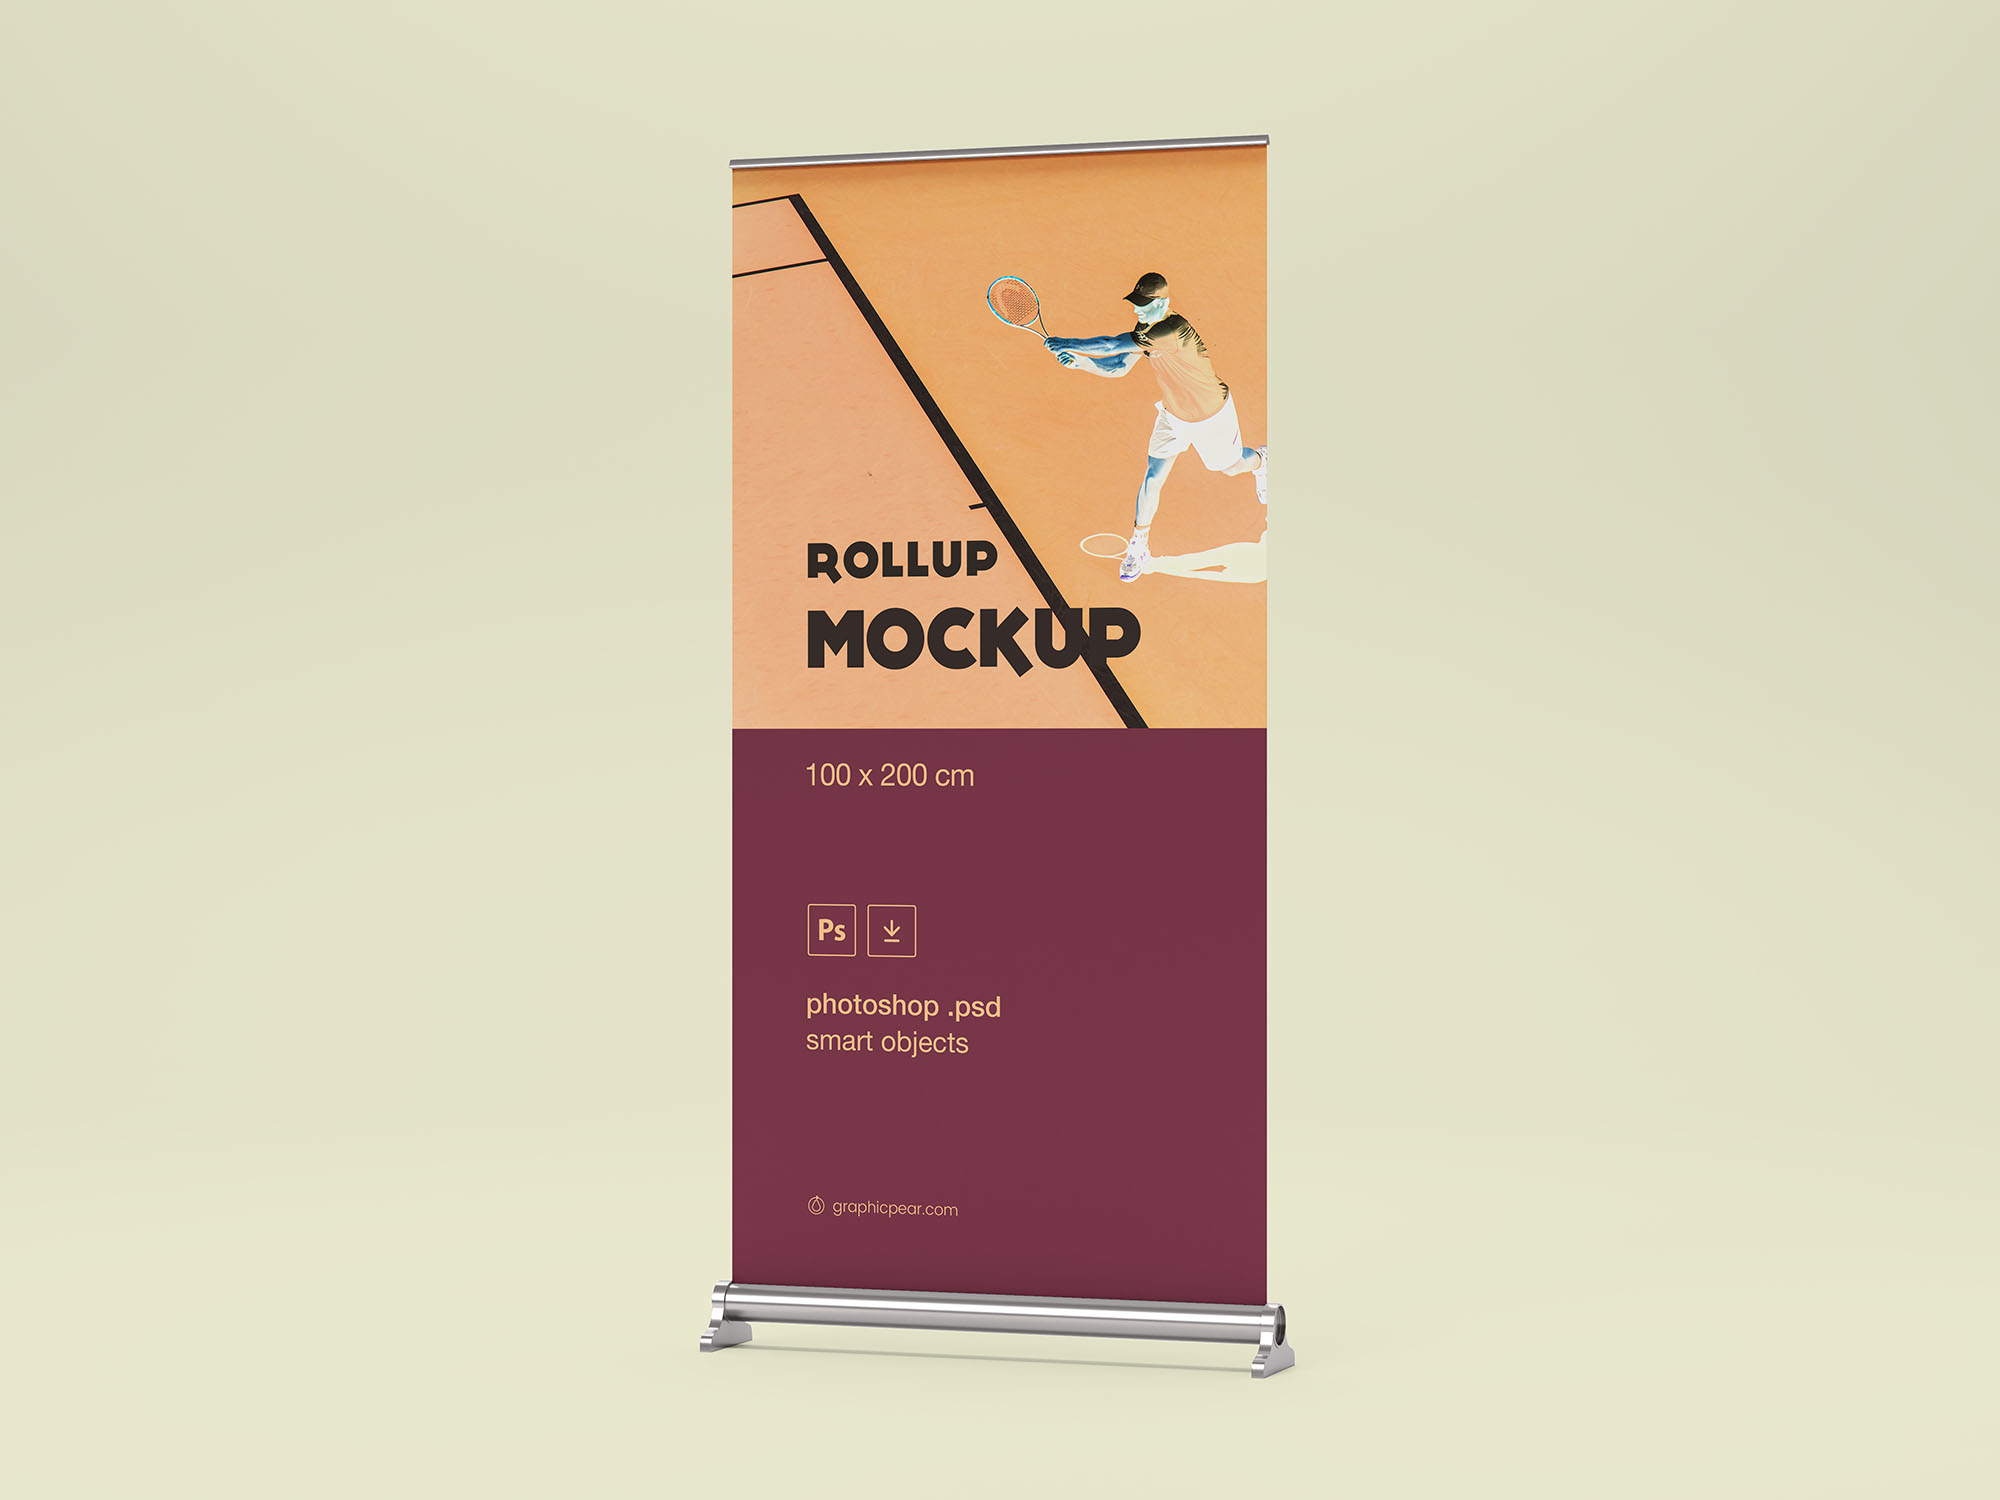 Rollup Mockup